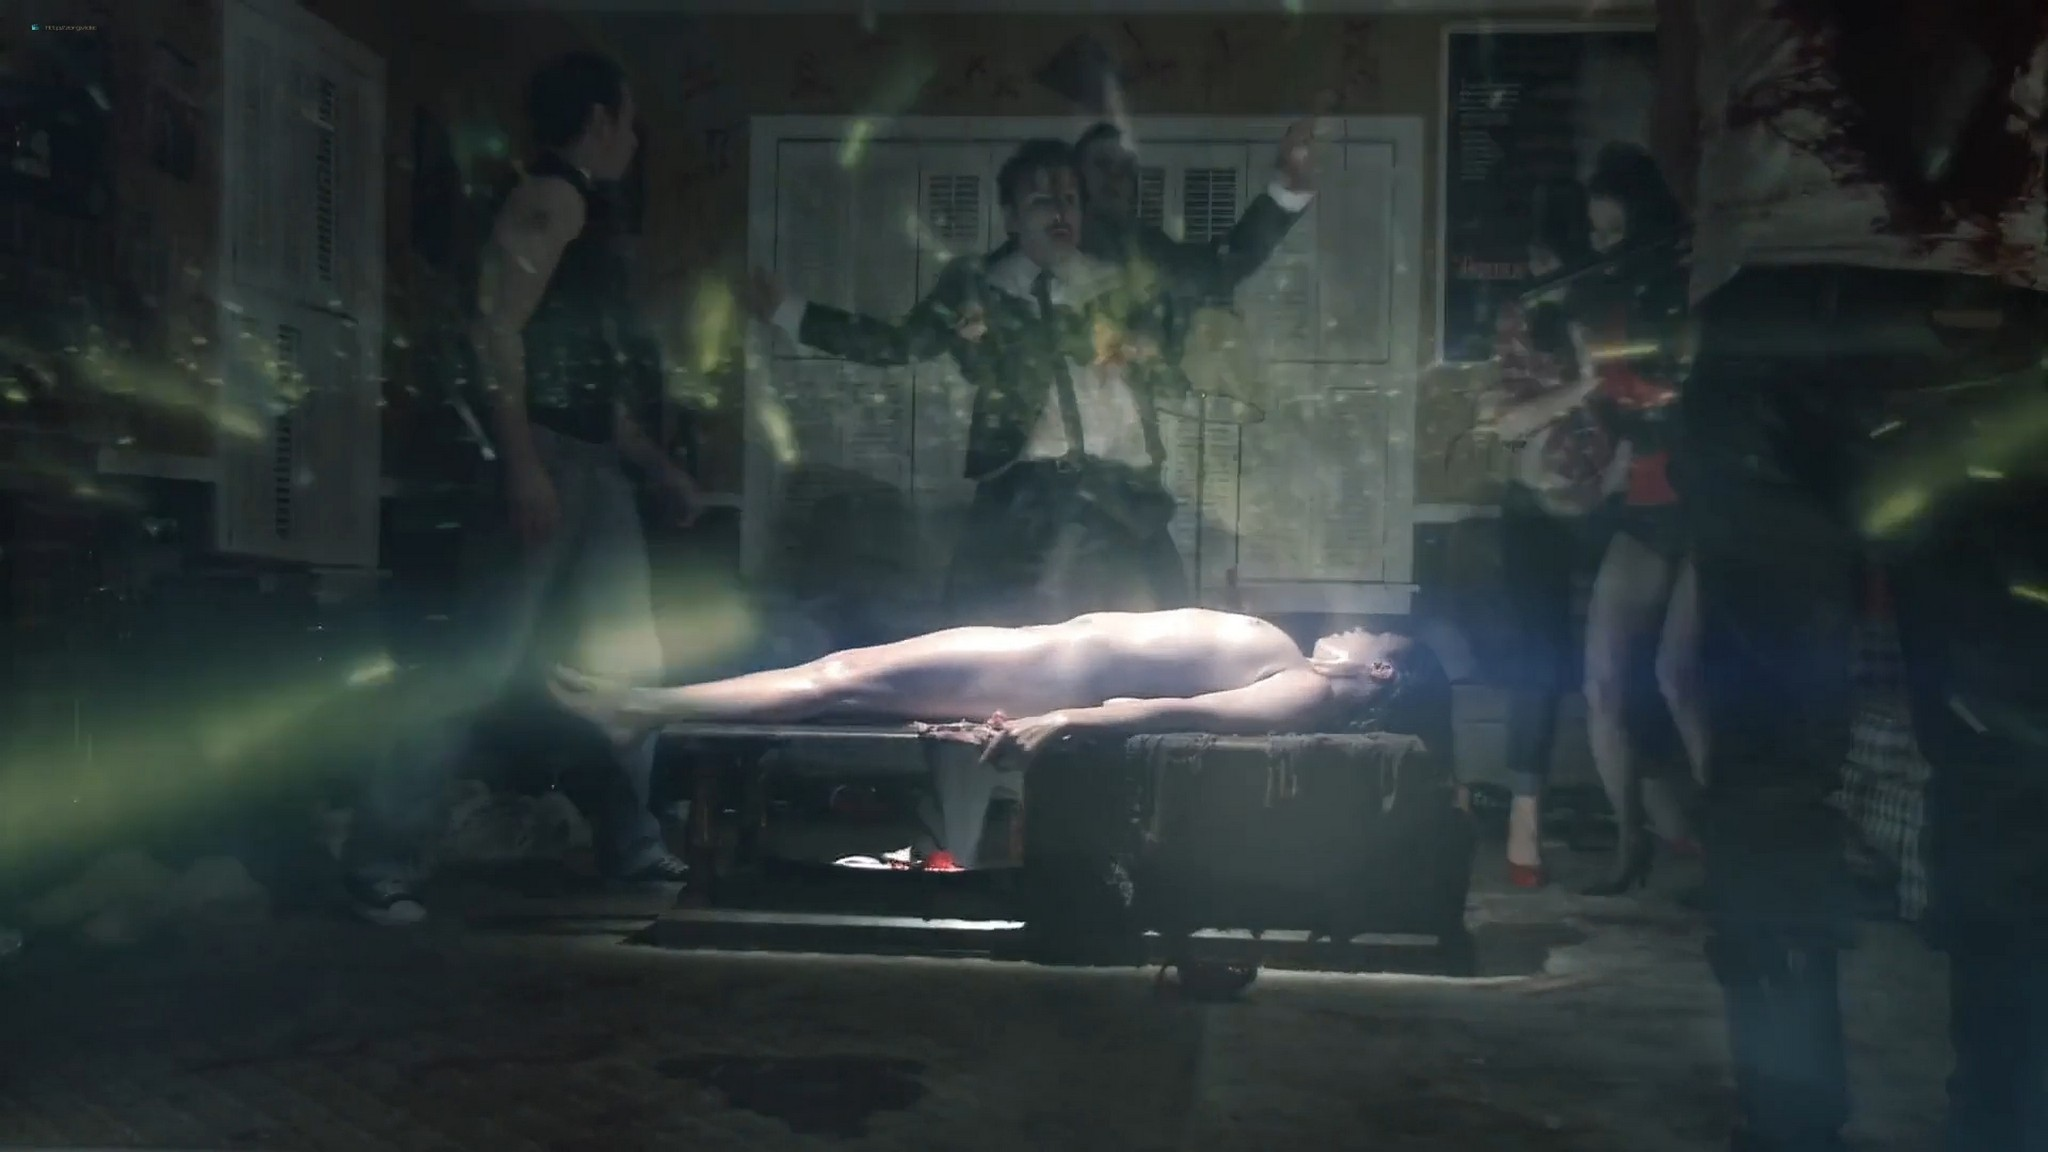 Taylor Cole hot sex Tiffany Shepis Francesca Brandelius naked The Violent Kind 2010 HD 1080p BluRay 015